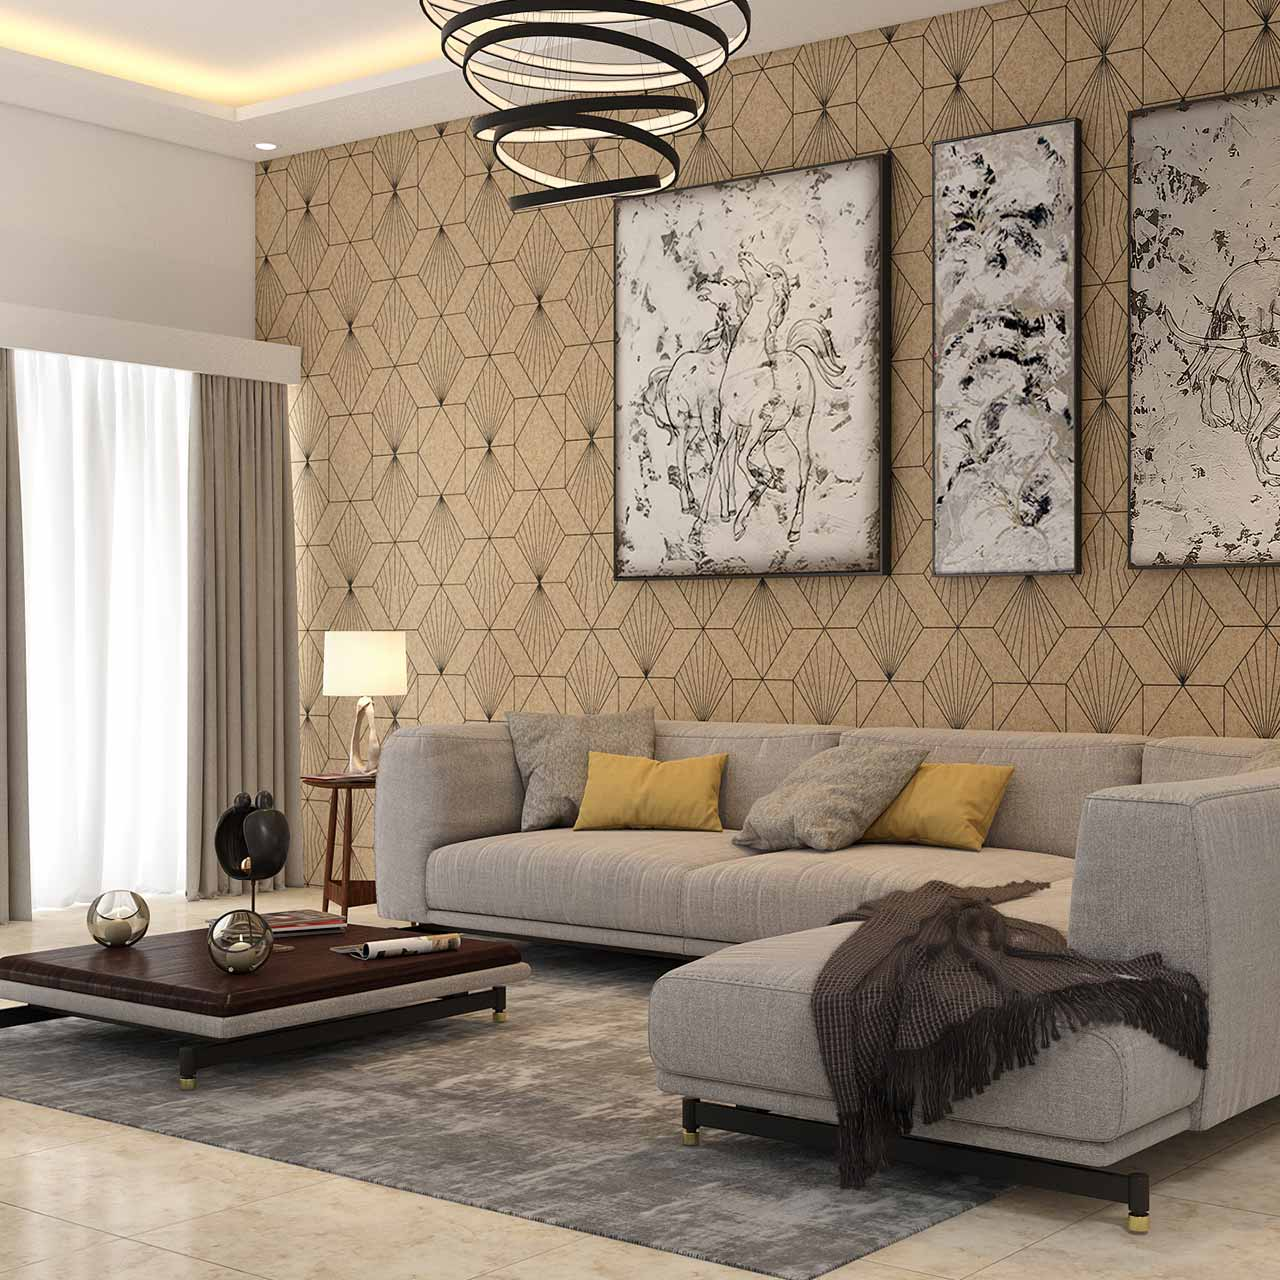 Check out living room interior design checklist before decide your living room interiors